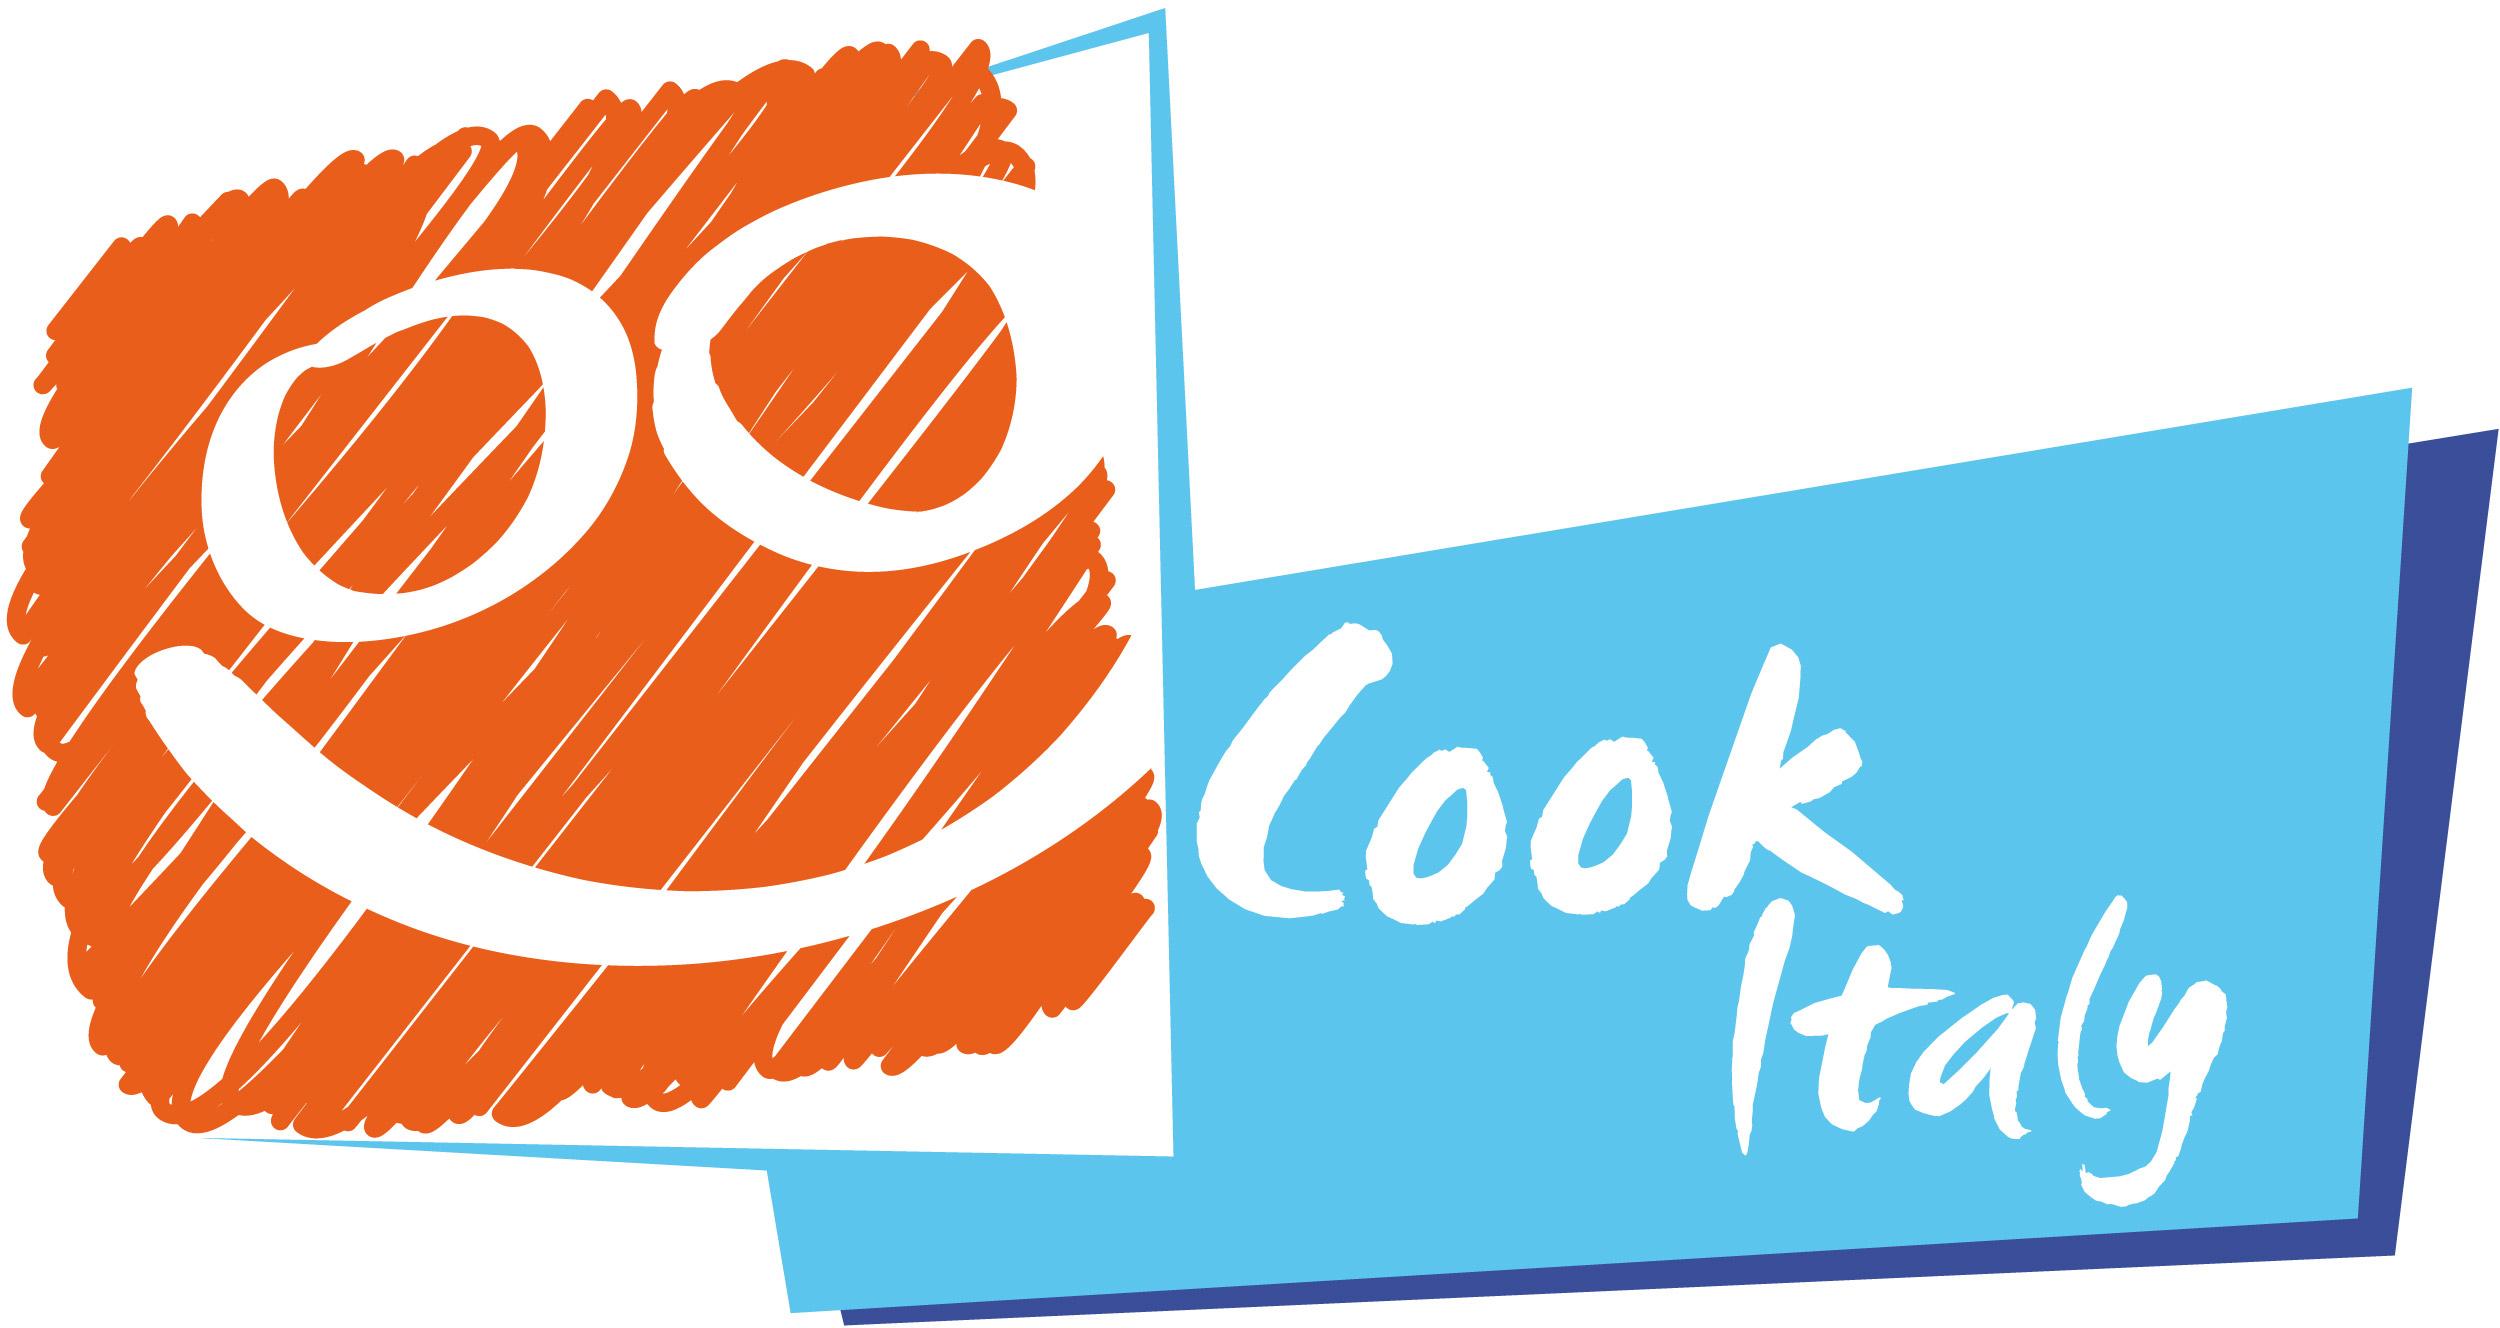 cook-italy.jpg